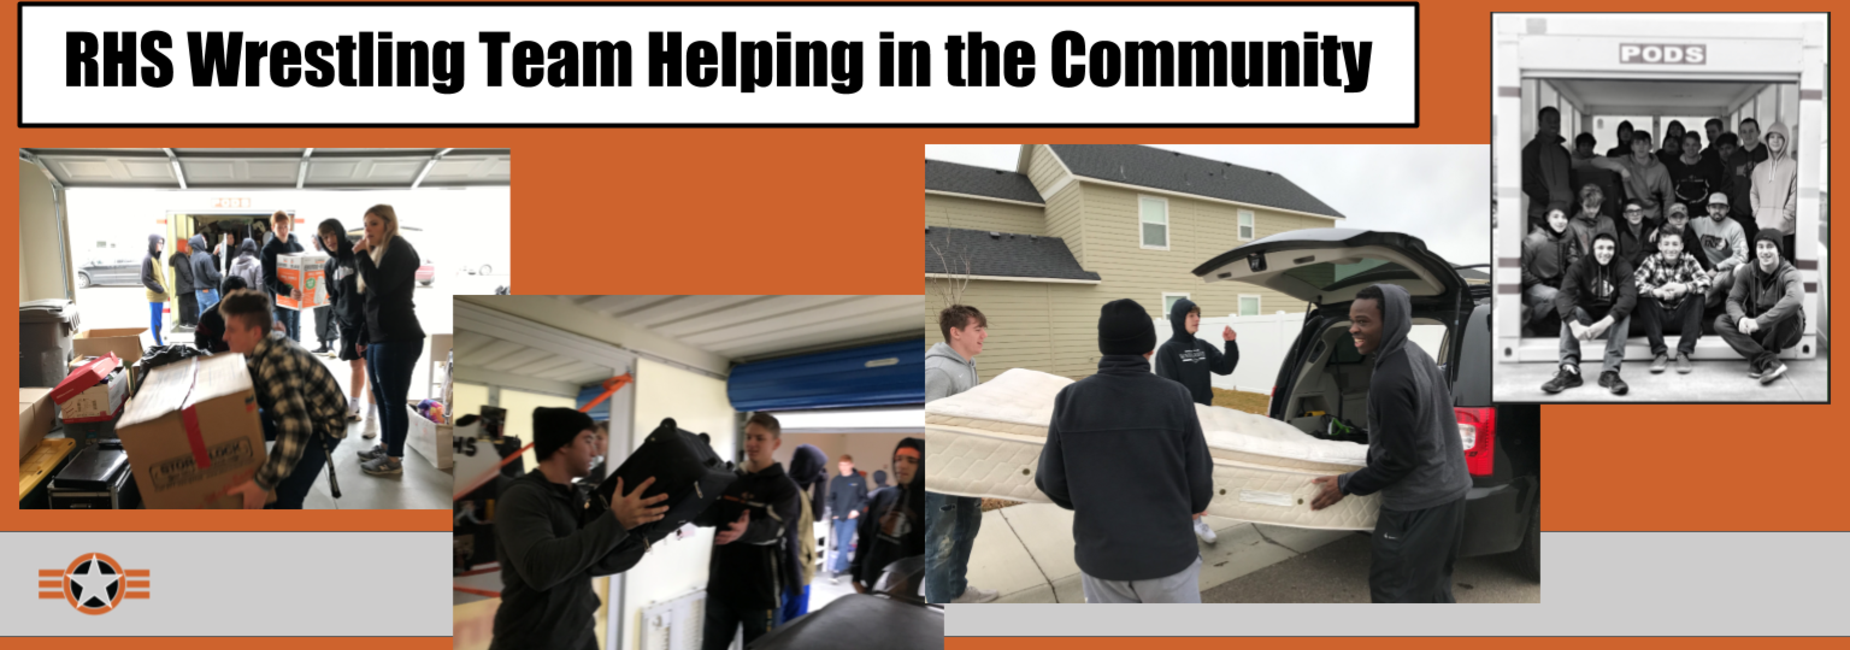 RHS Wrestling Team Helping in the community